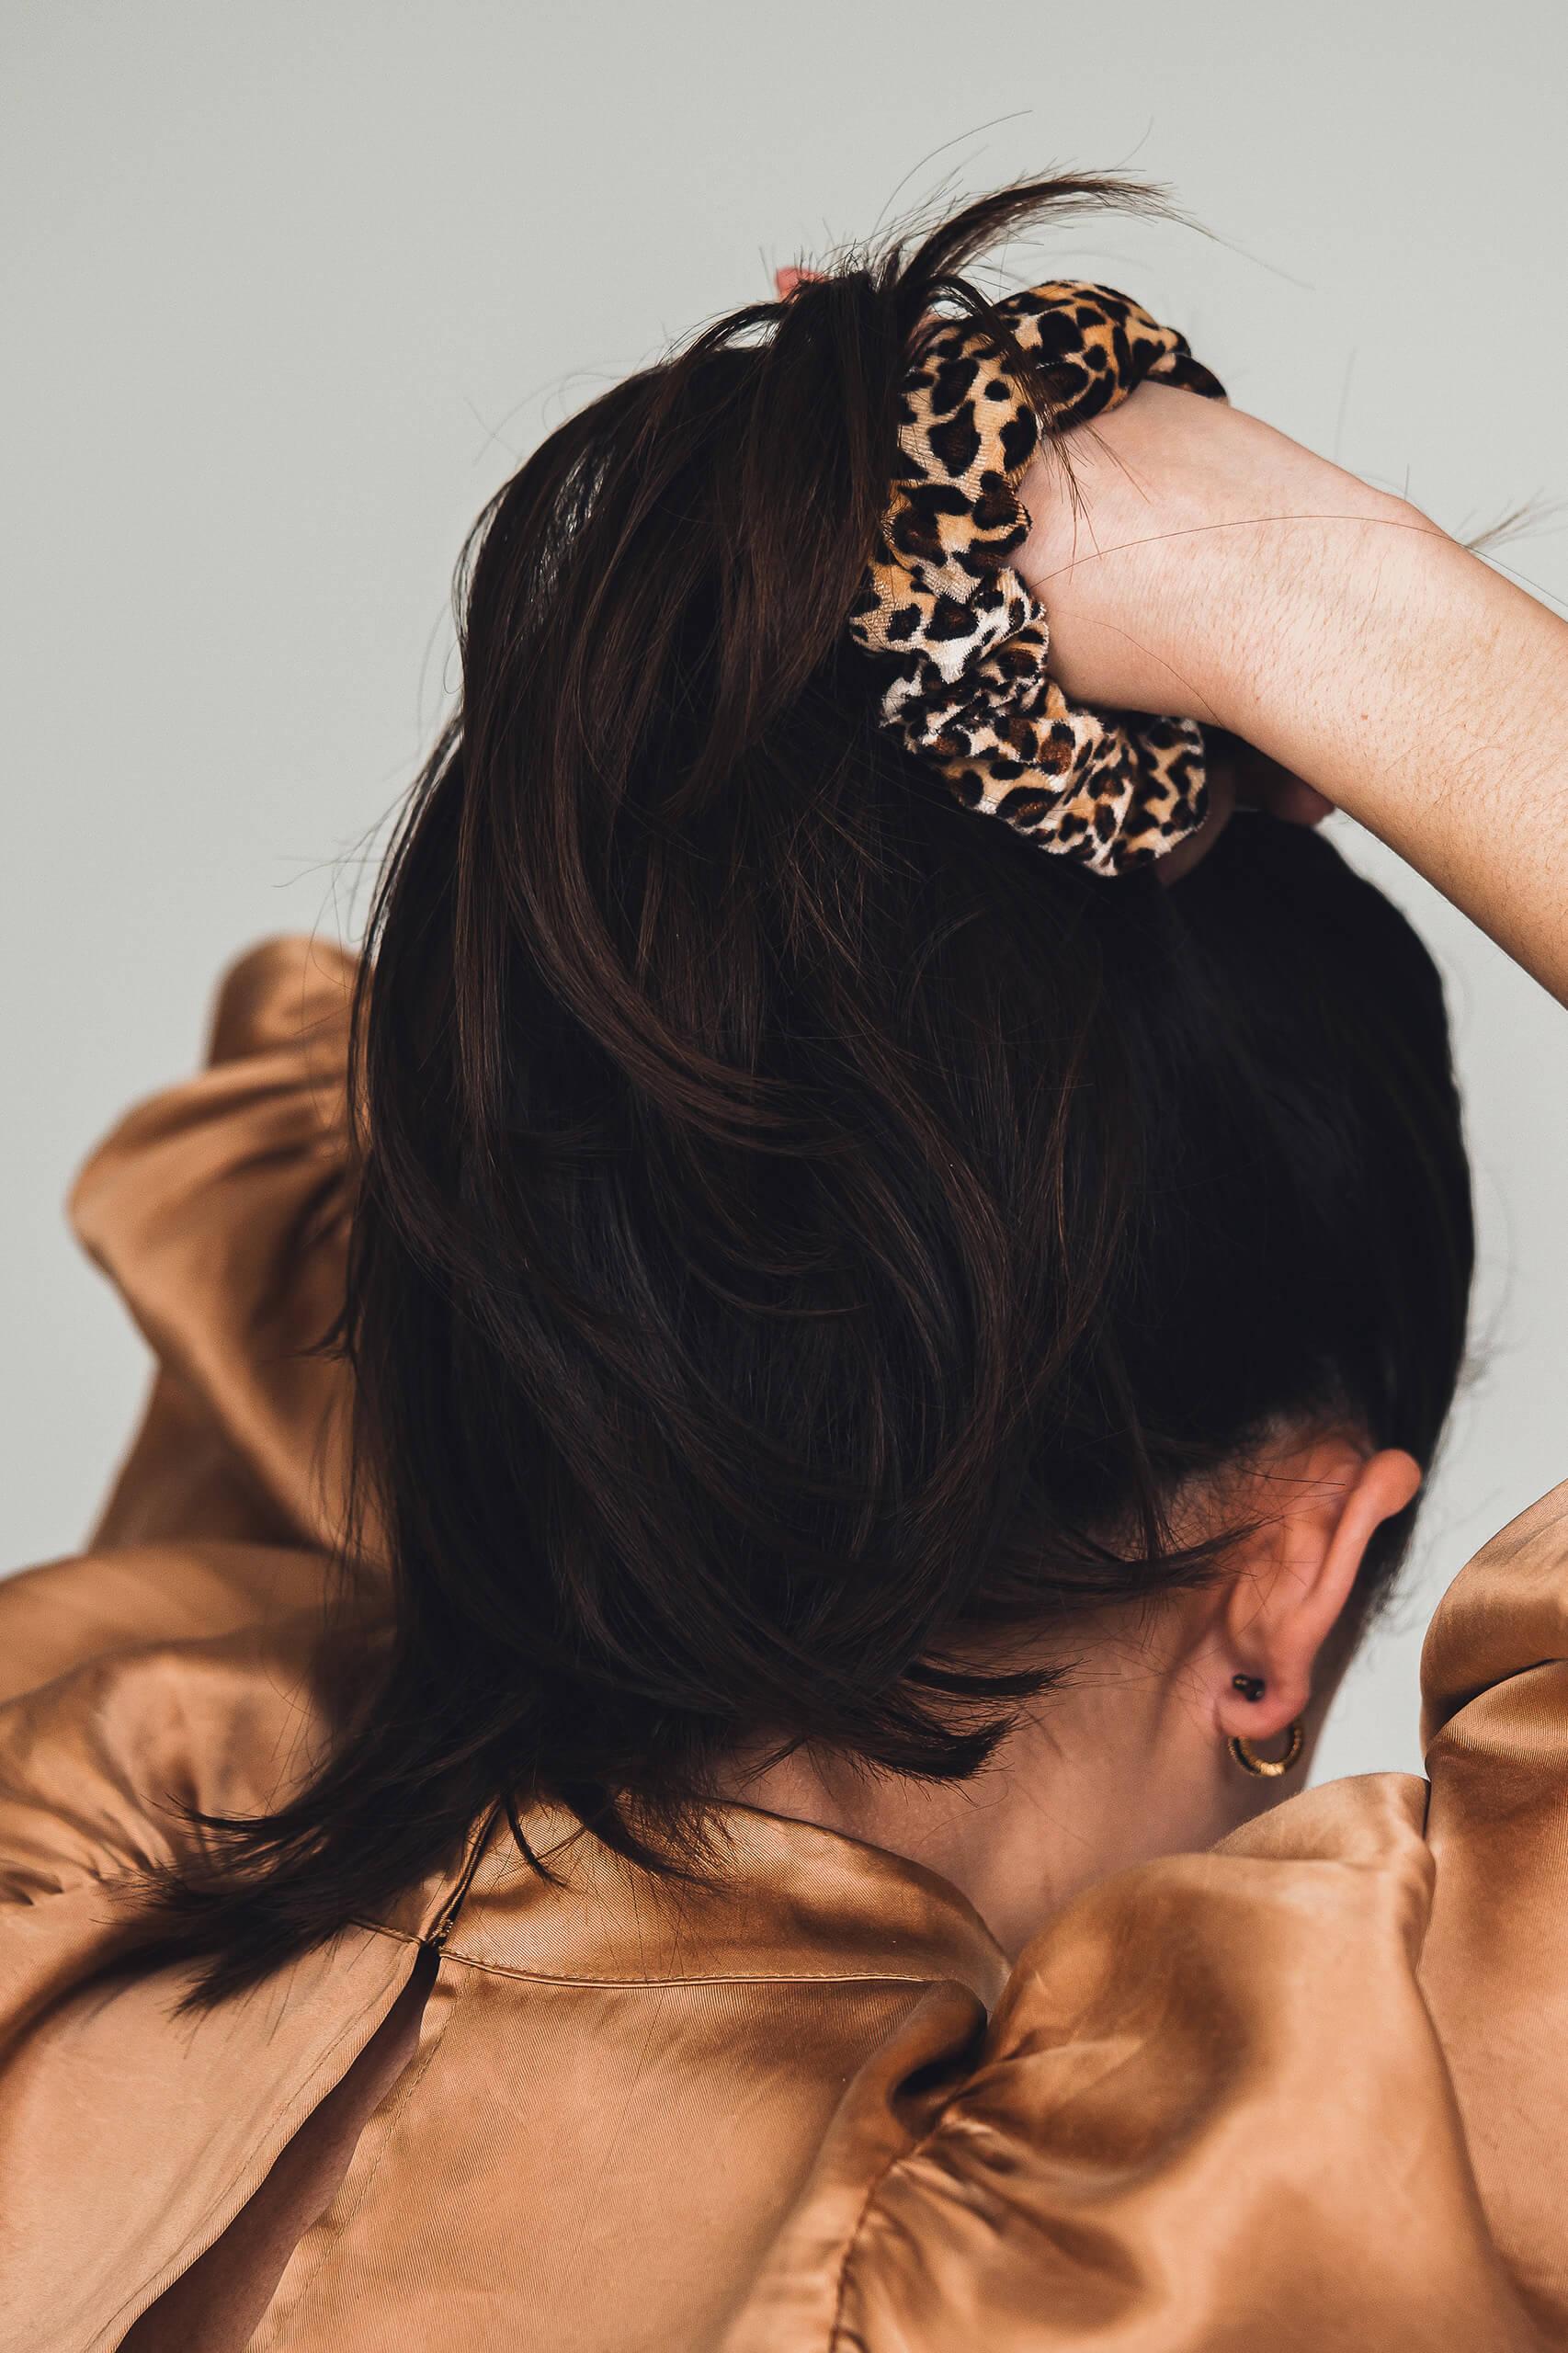 Model met panterprint scrunchie